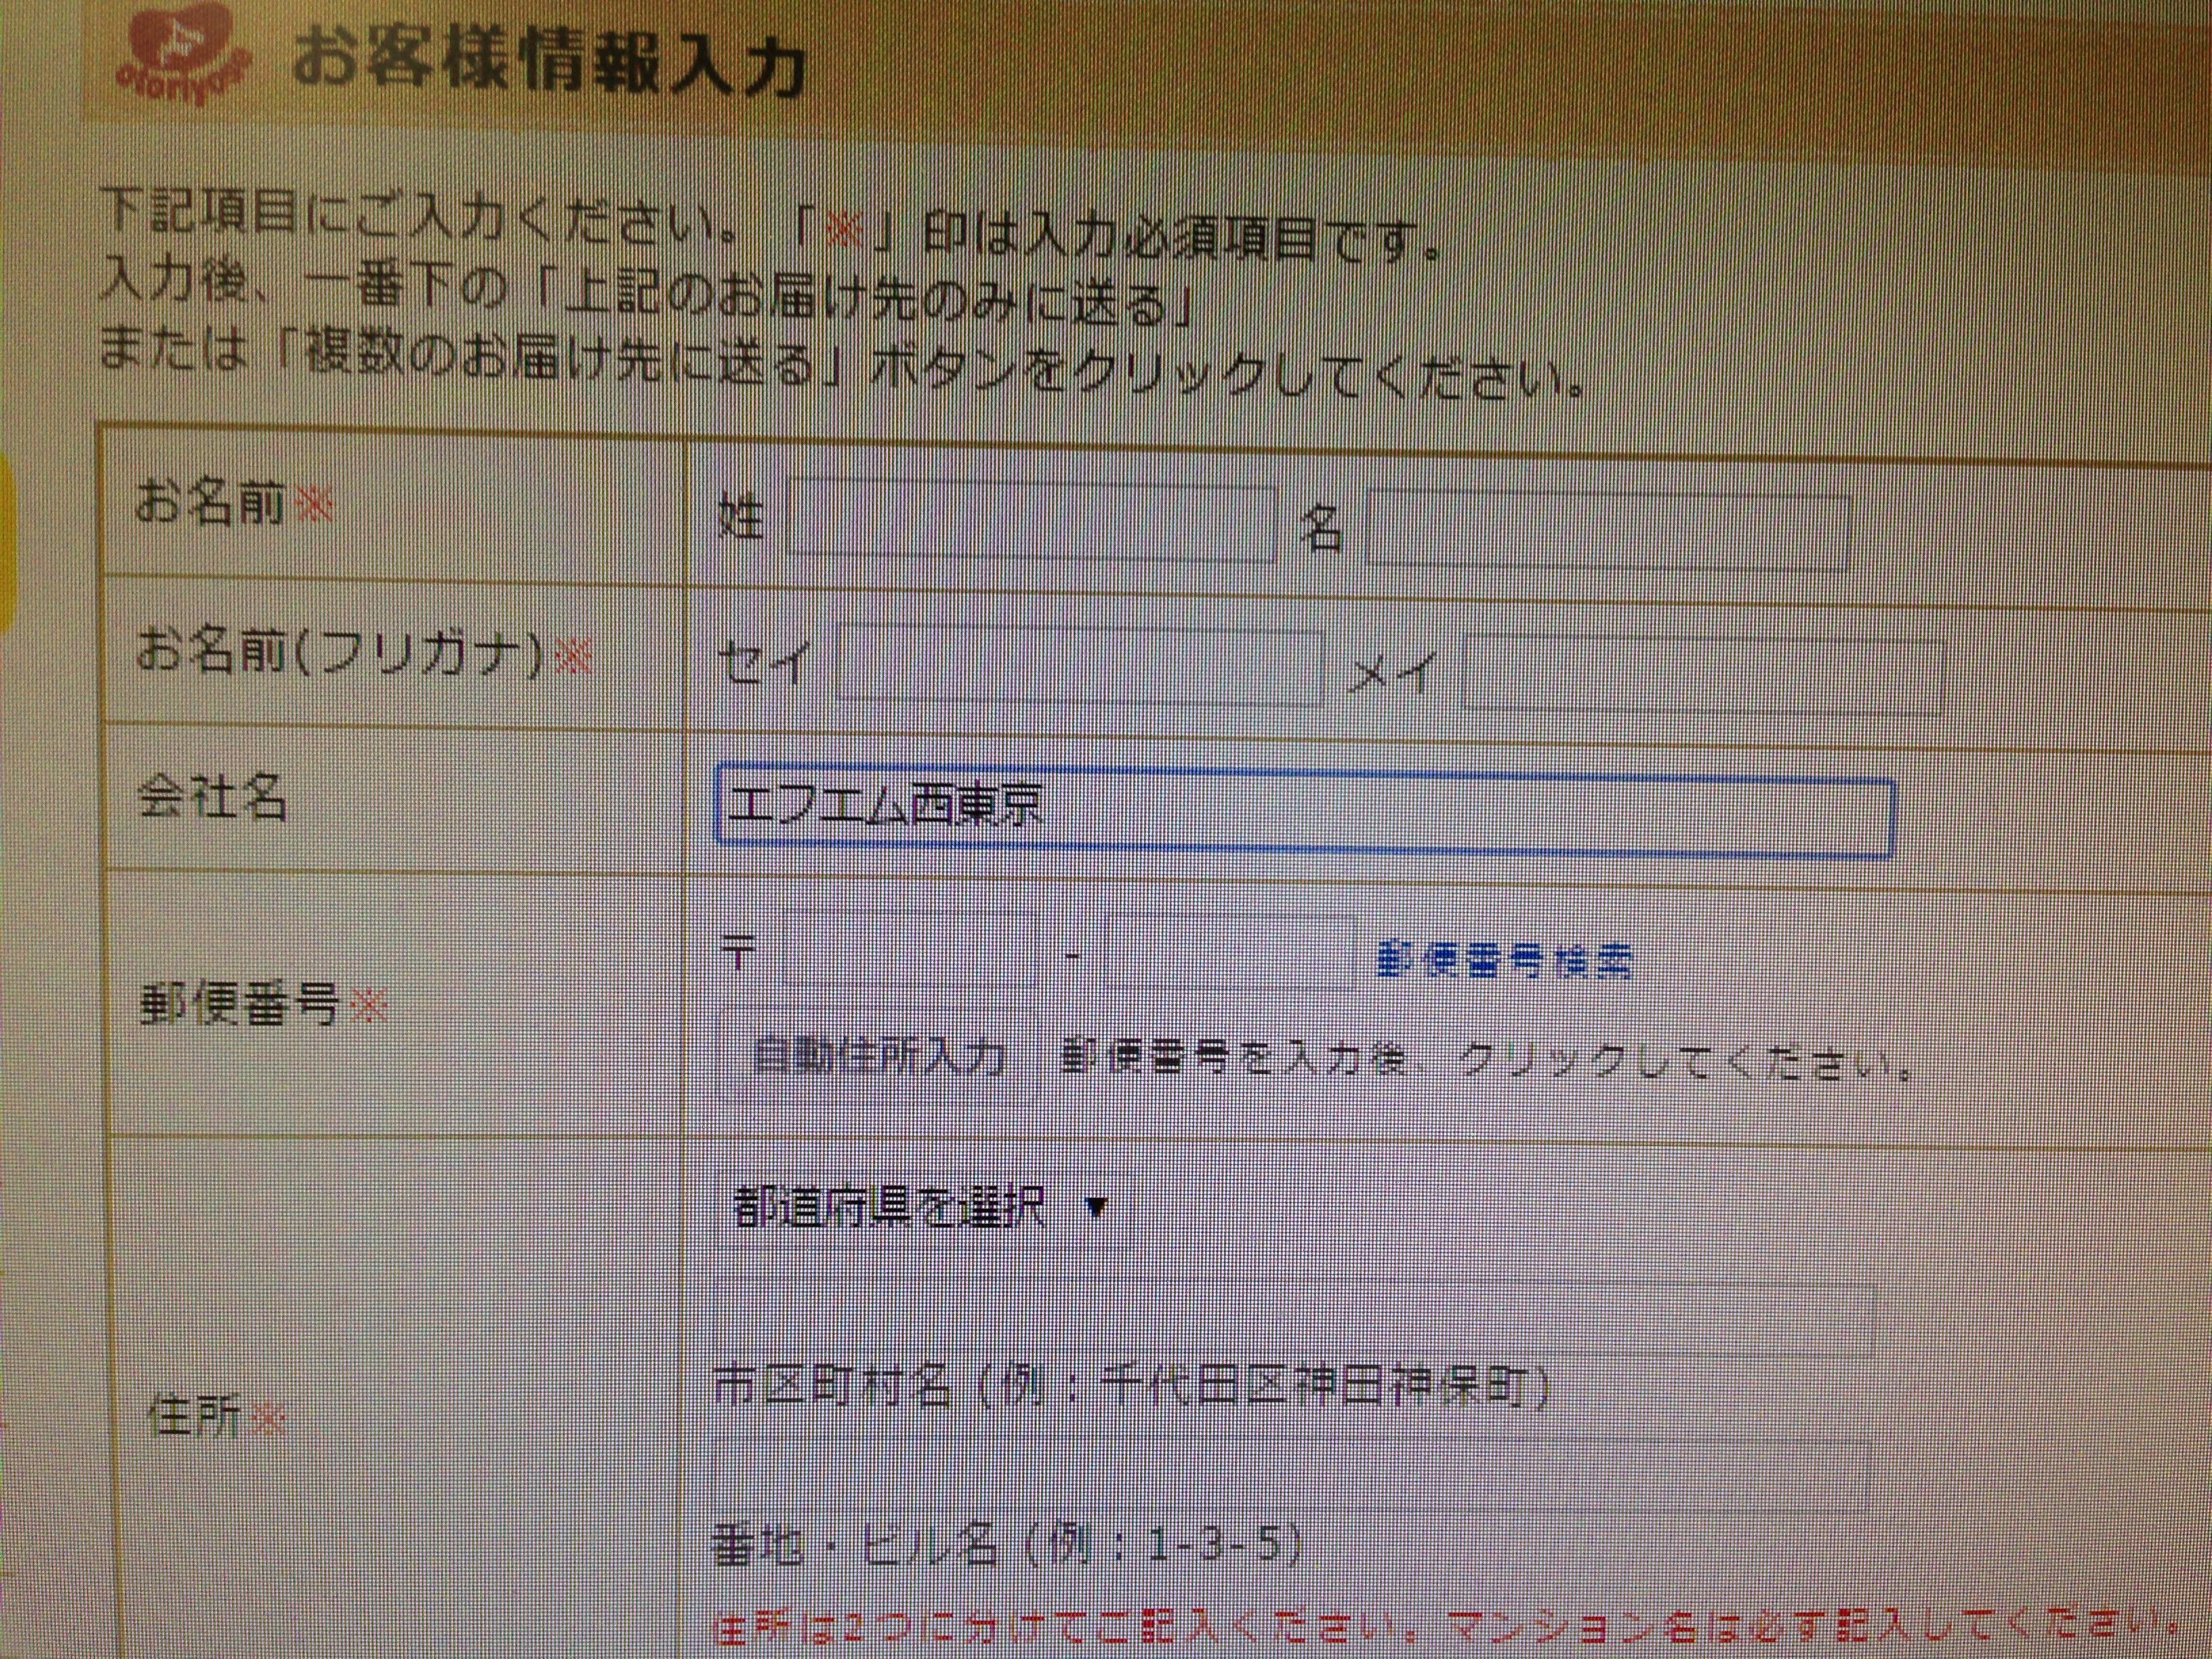 IMG_44691.JPG